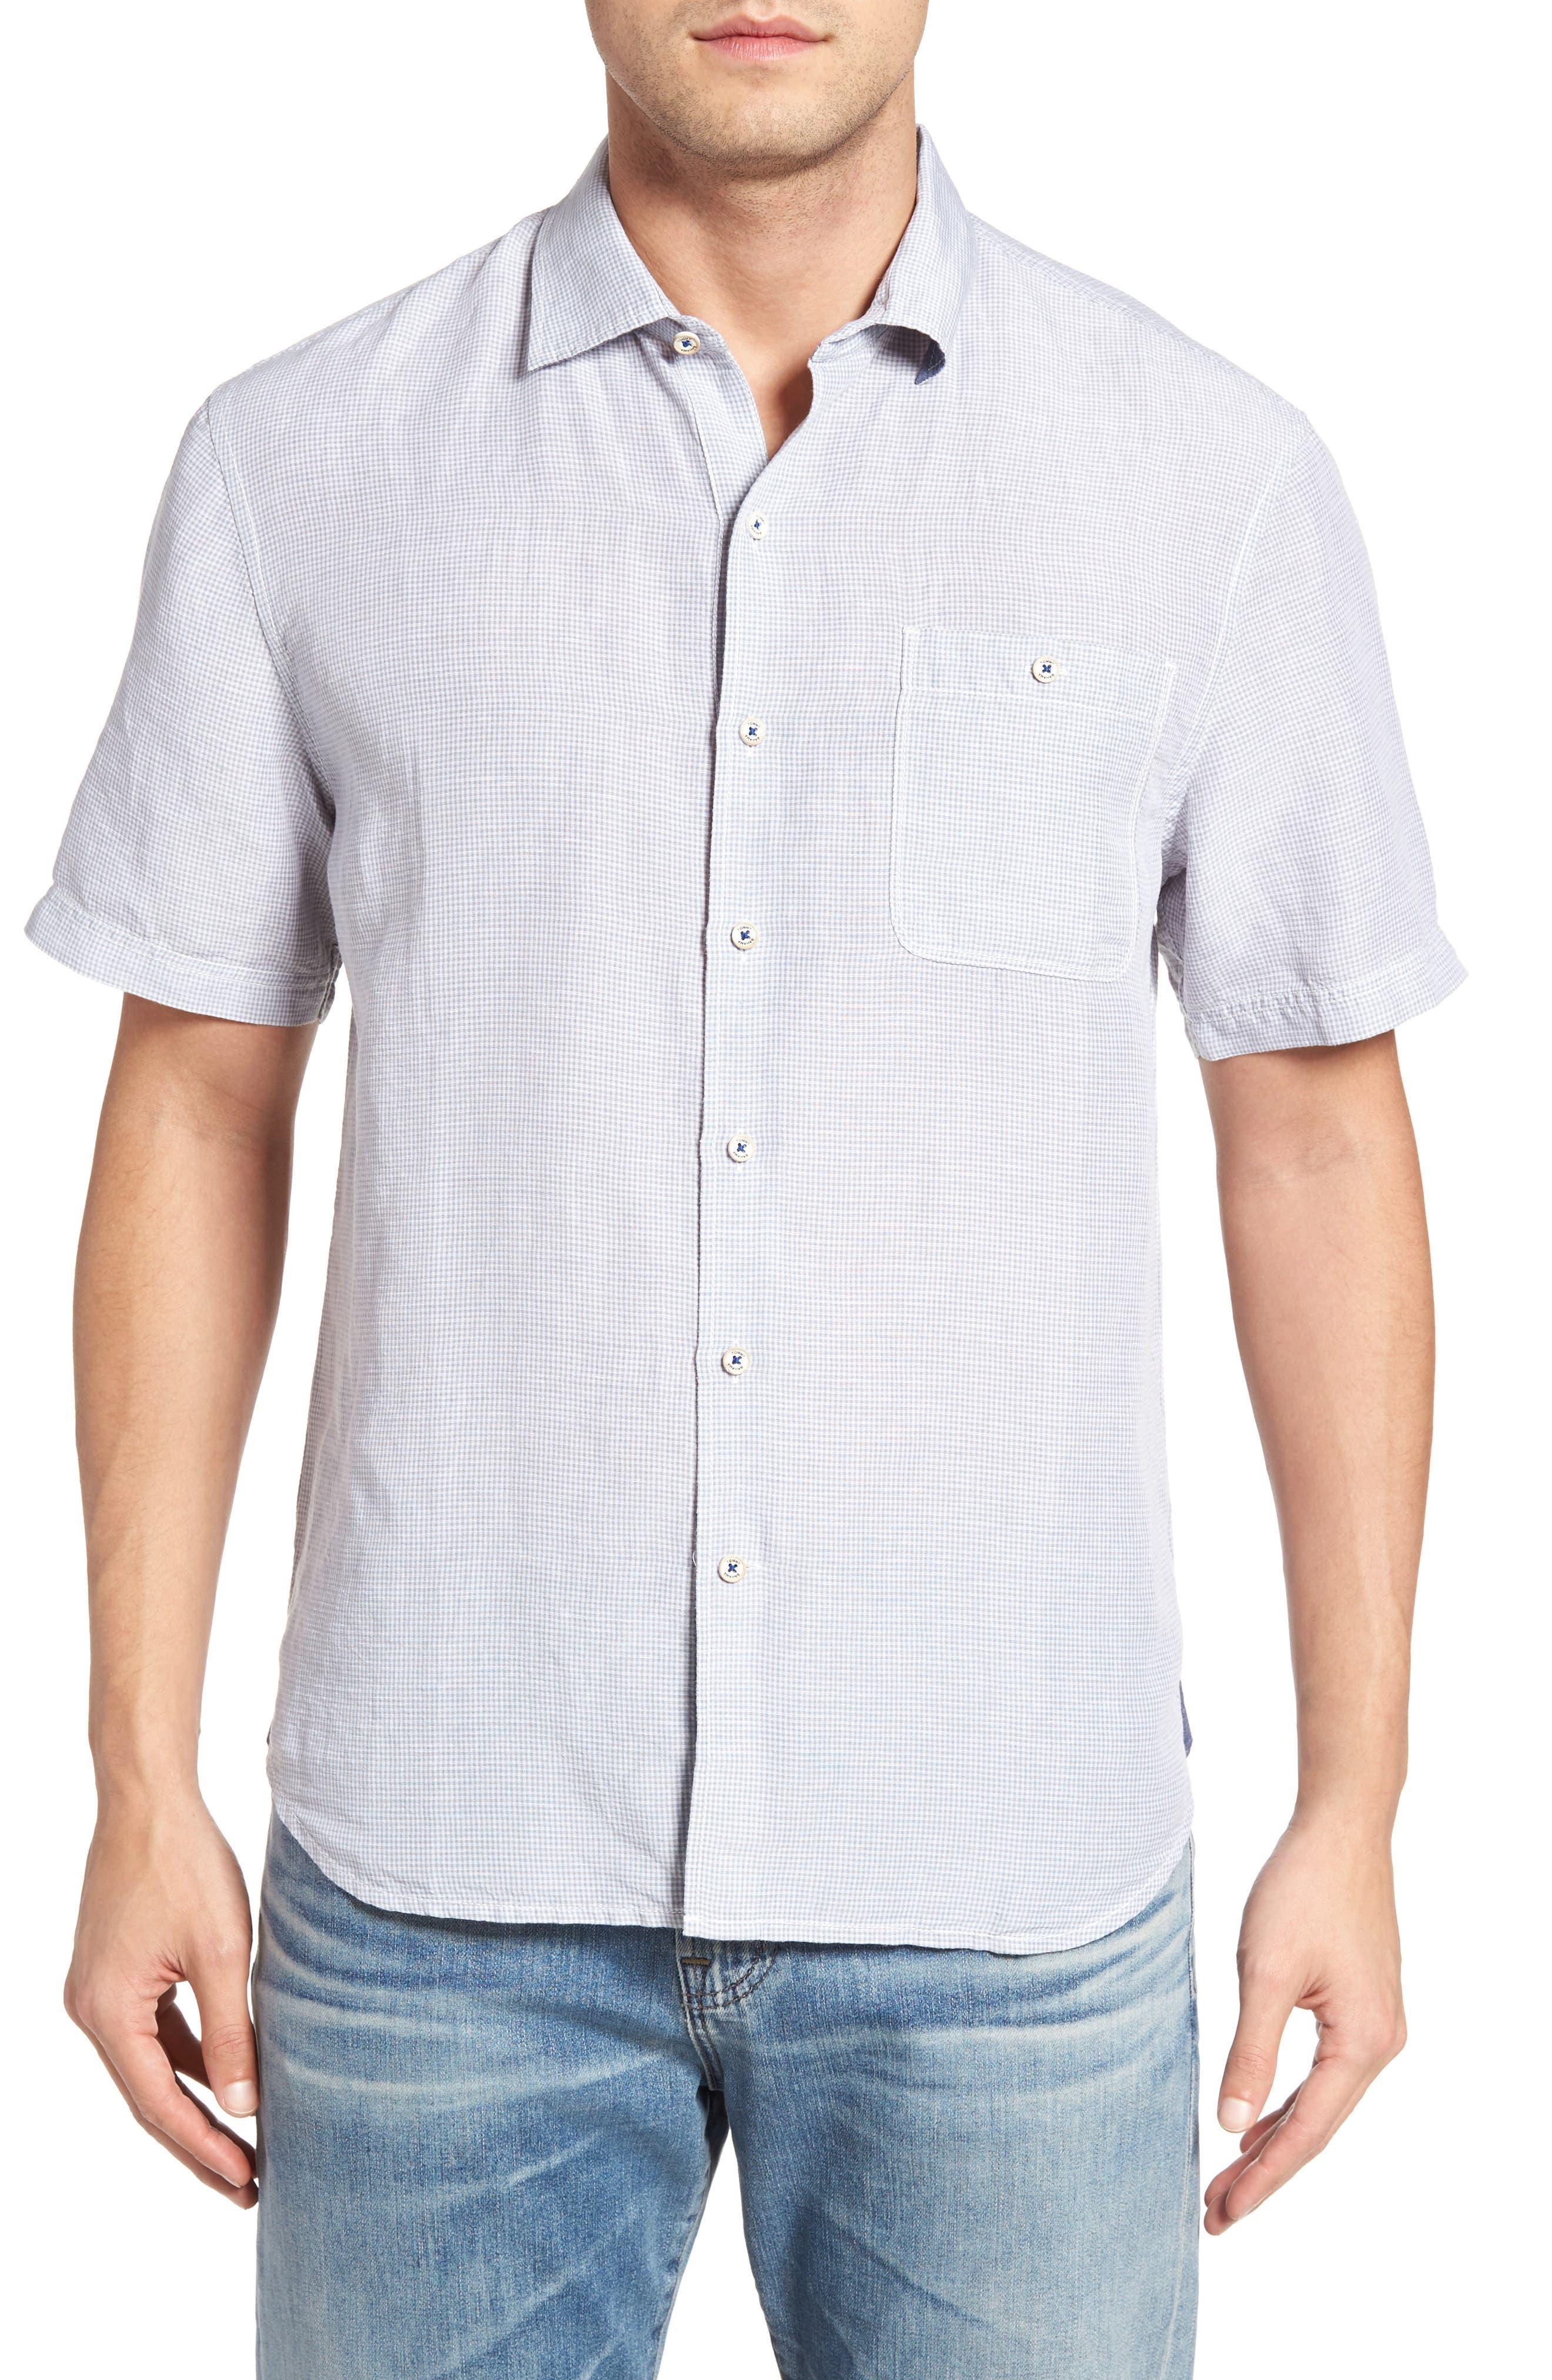 Tommy Bahama Sand Standard Fit Check Linen Blend Sport Shirt